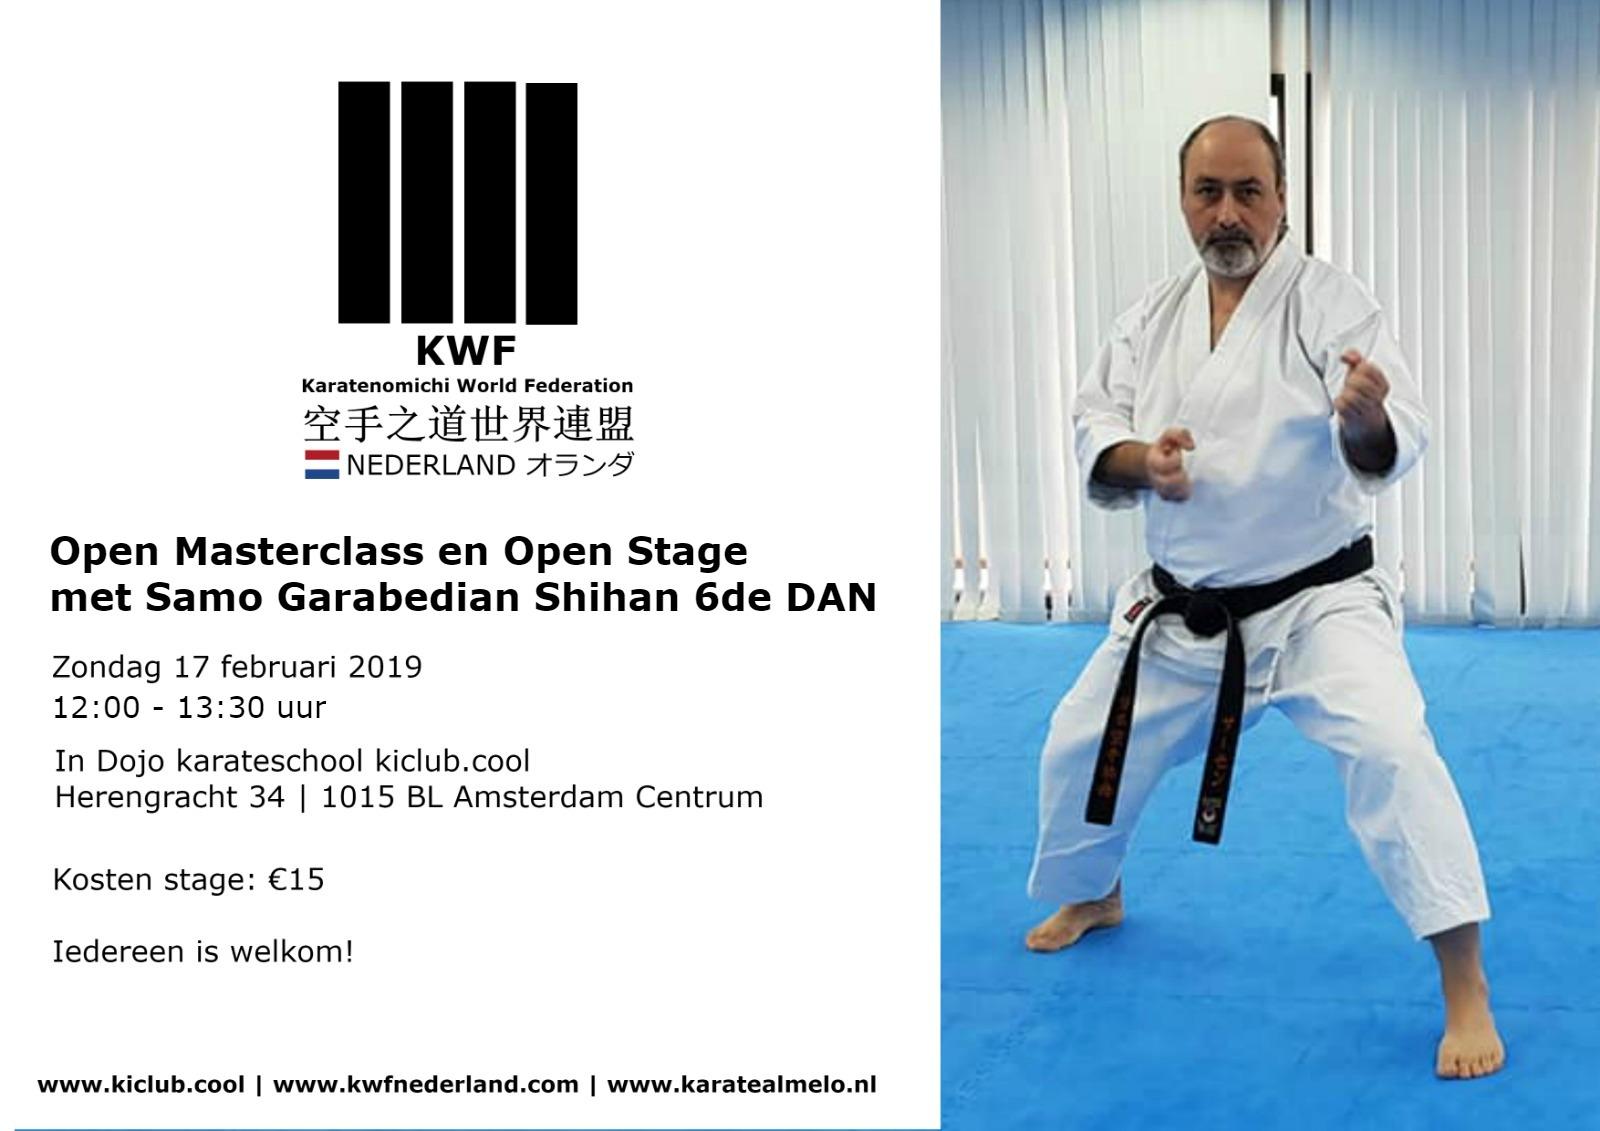 masterclass ki club.cool Eerste KWF stage met Samo Garabedian-KWF-logo ki-club-cool-Amsterdam-Monnickendam bezorgd door karateschool ki club.cool in Amsterdam Centrum en Monnickendam voor traditioneel Shotokan karate-do